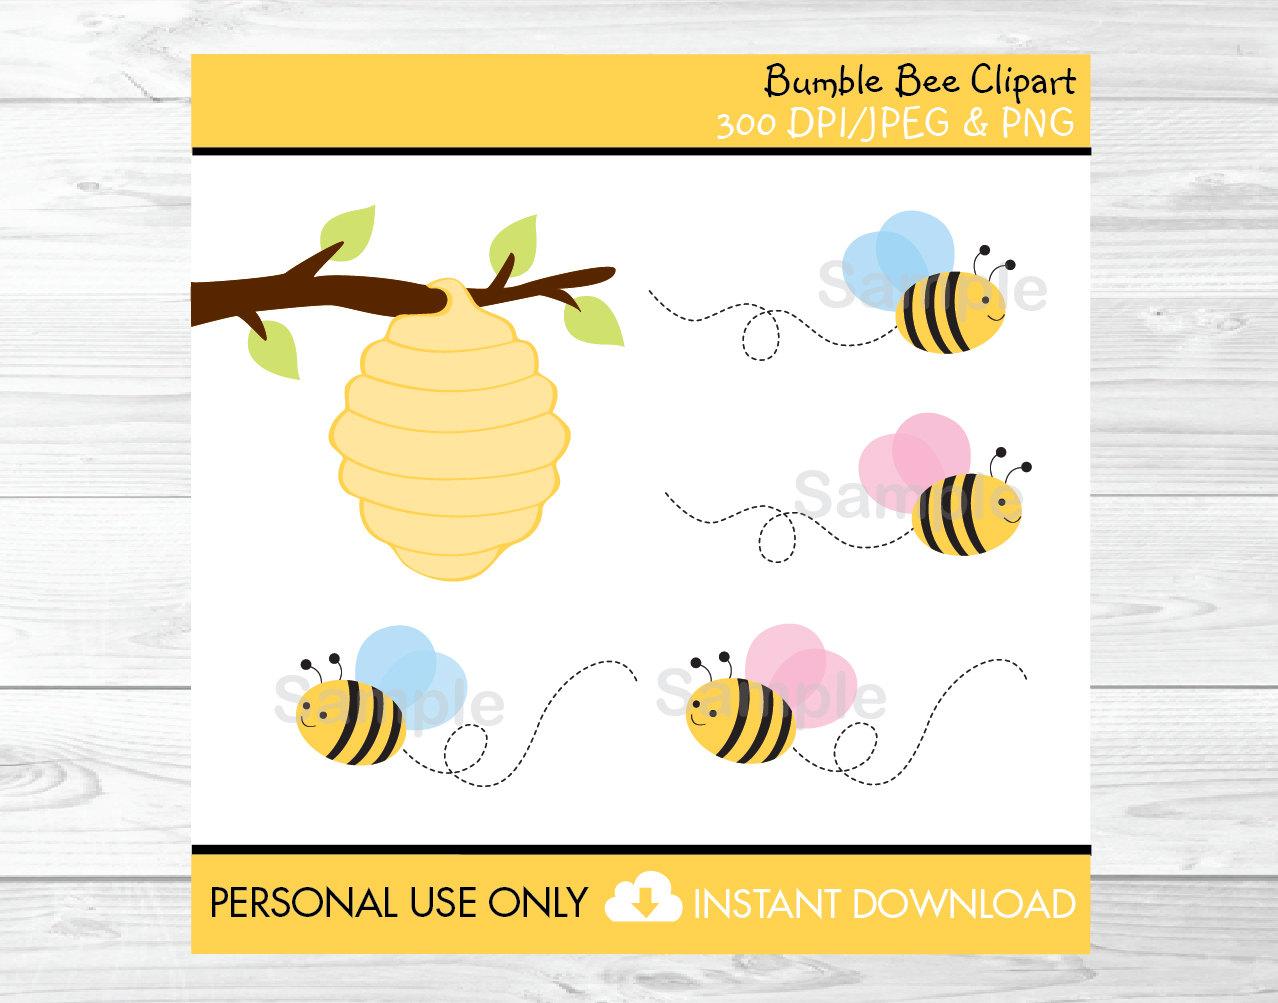 Bumblebee clipart beehive. Bumble bee clip art